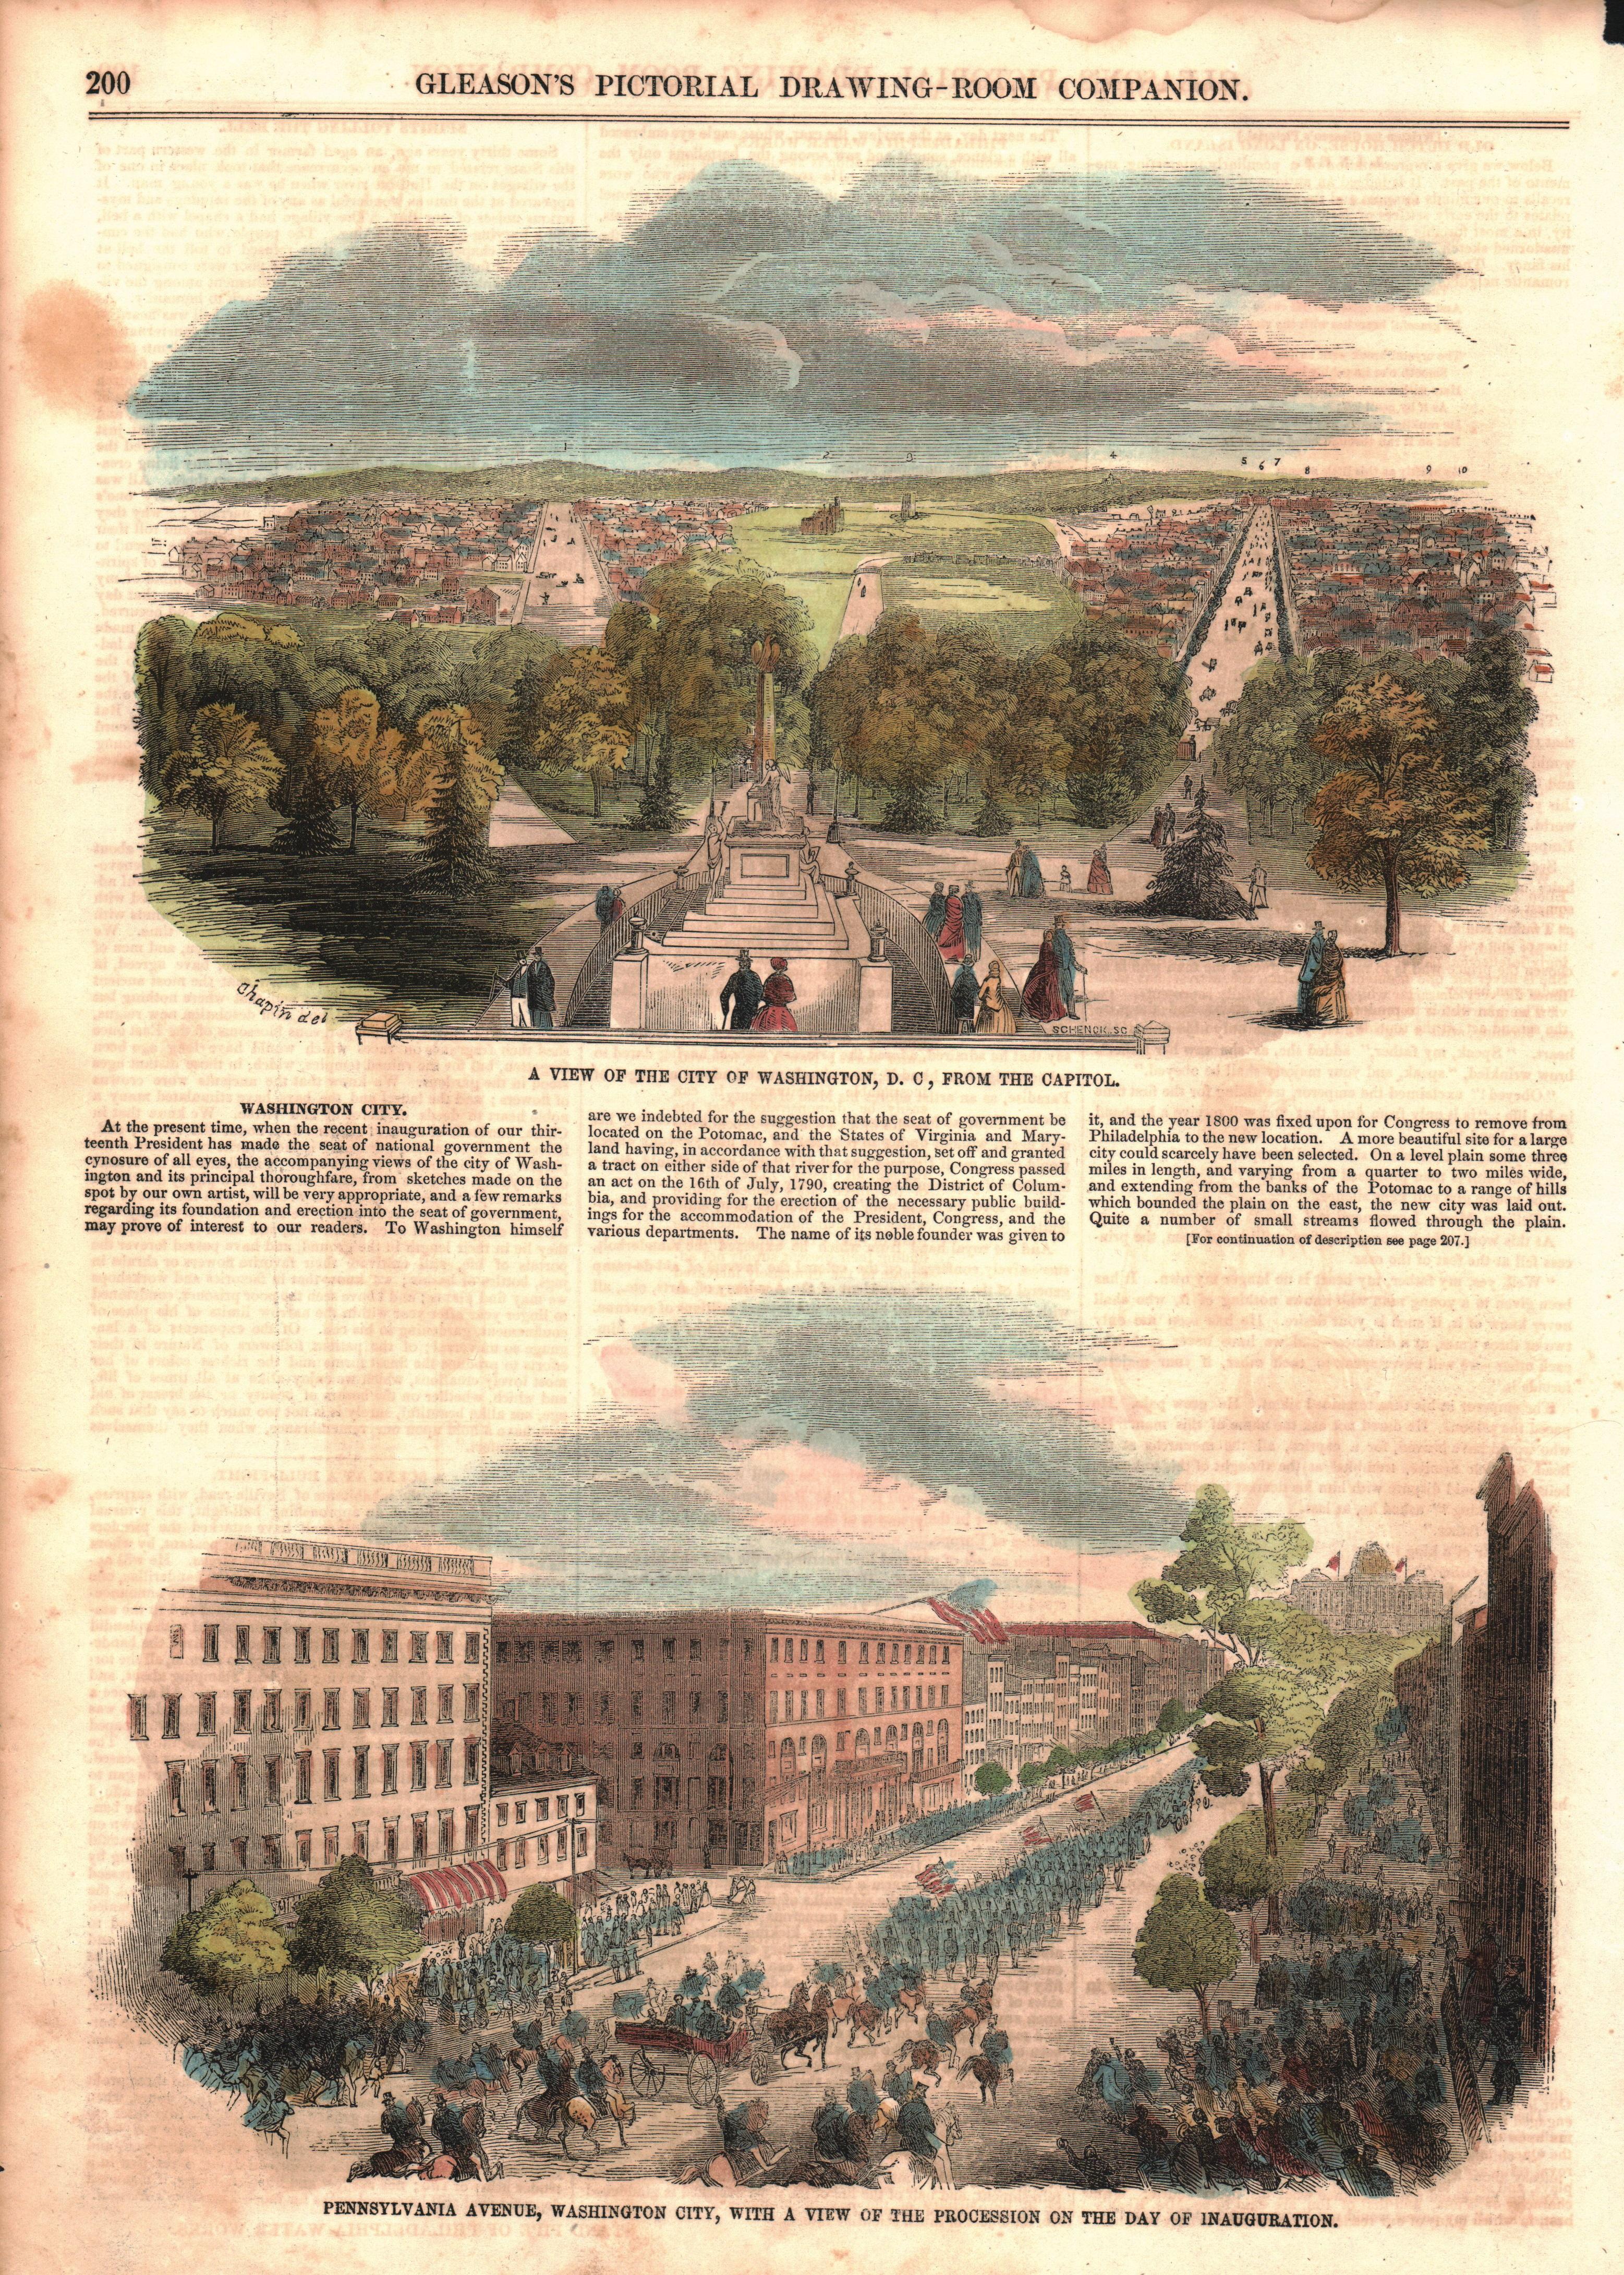 Washington, DC and Pennsylvania Avenue